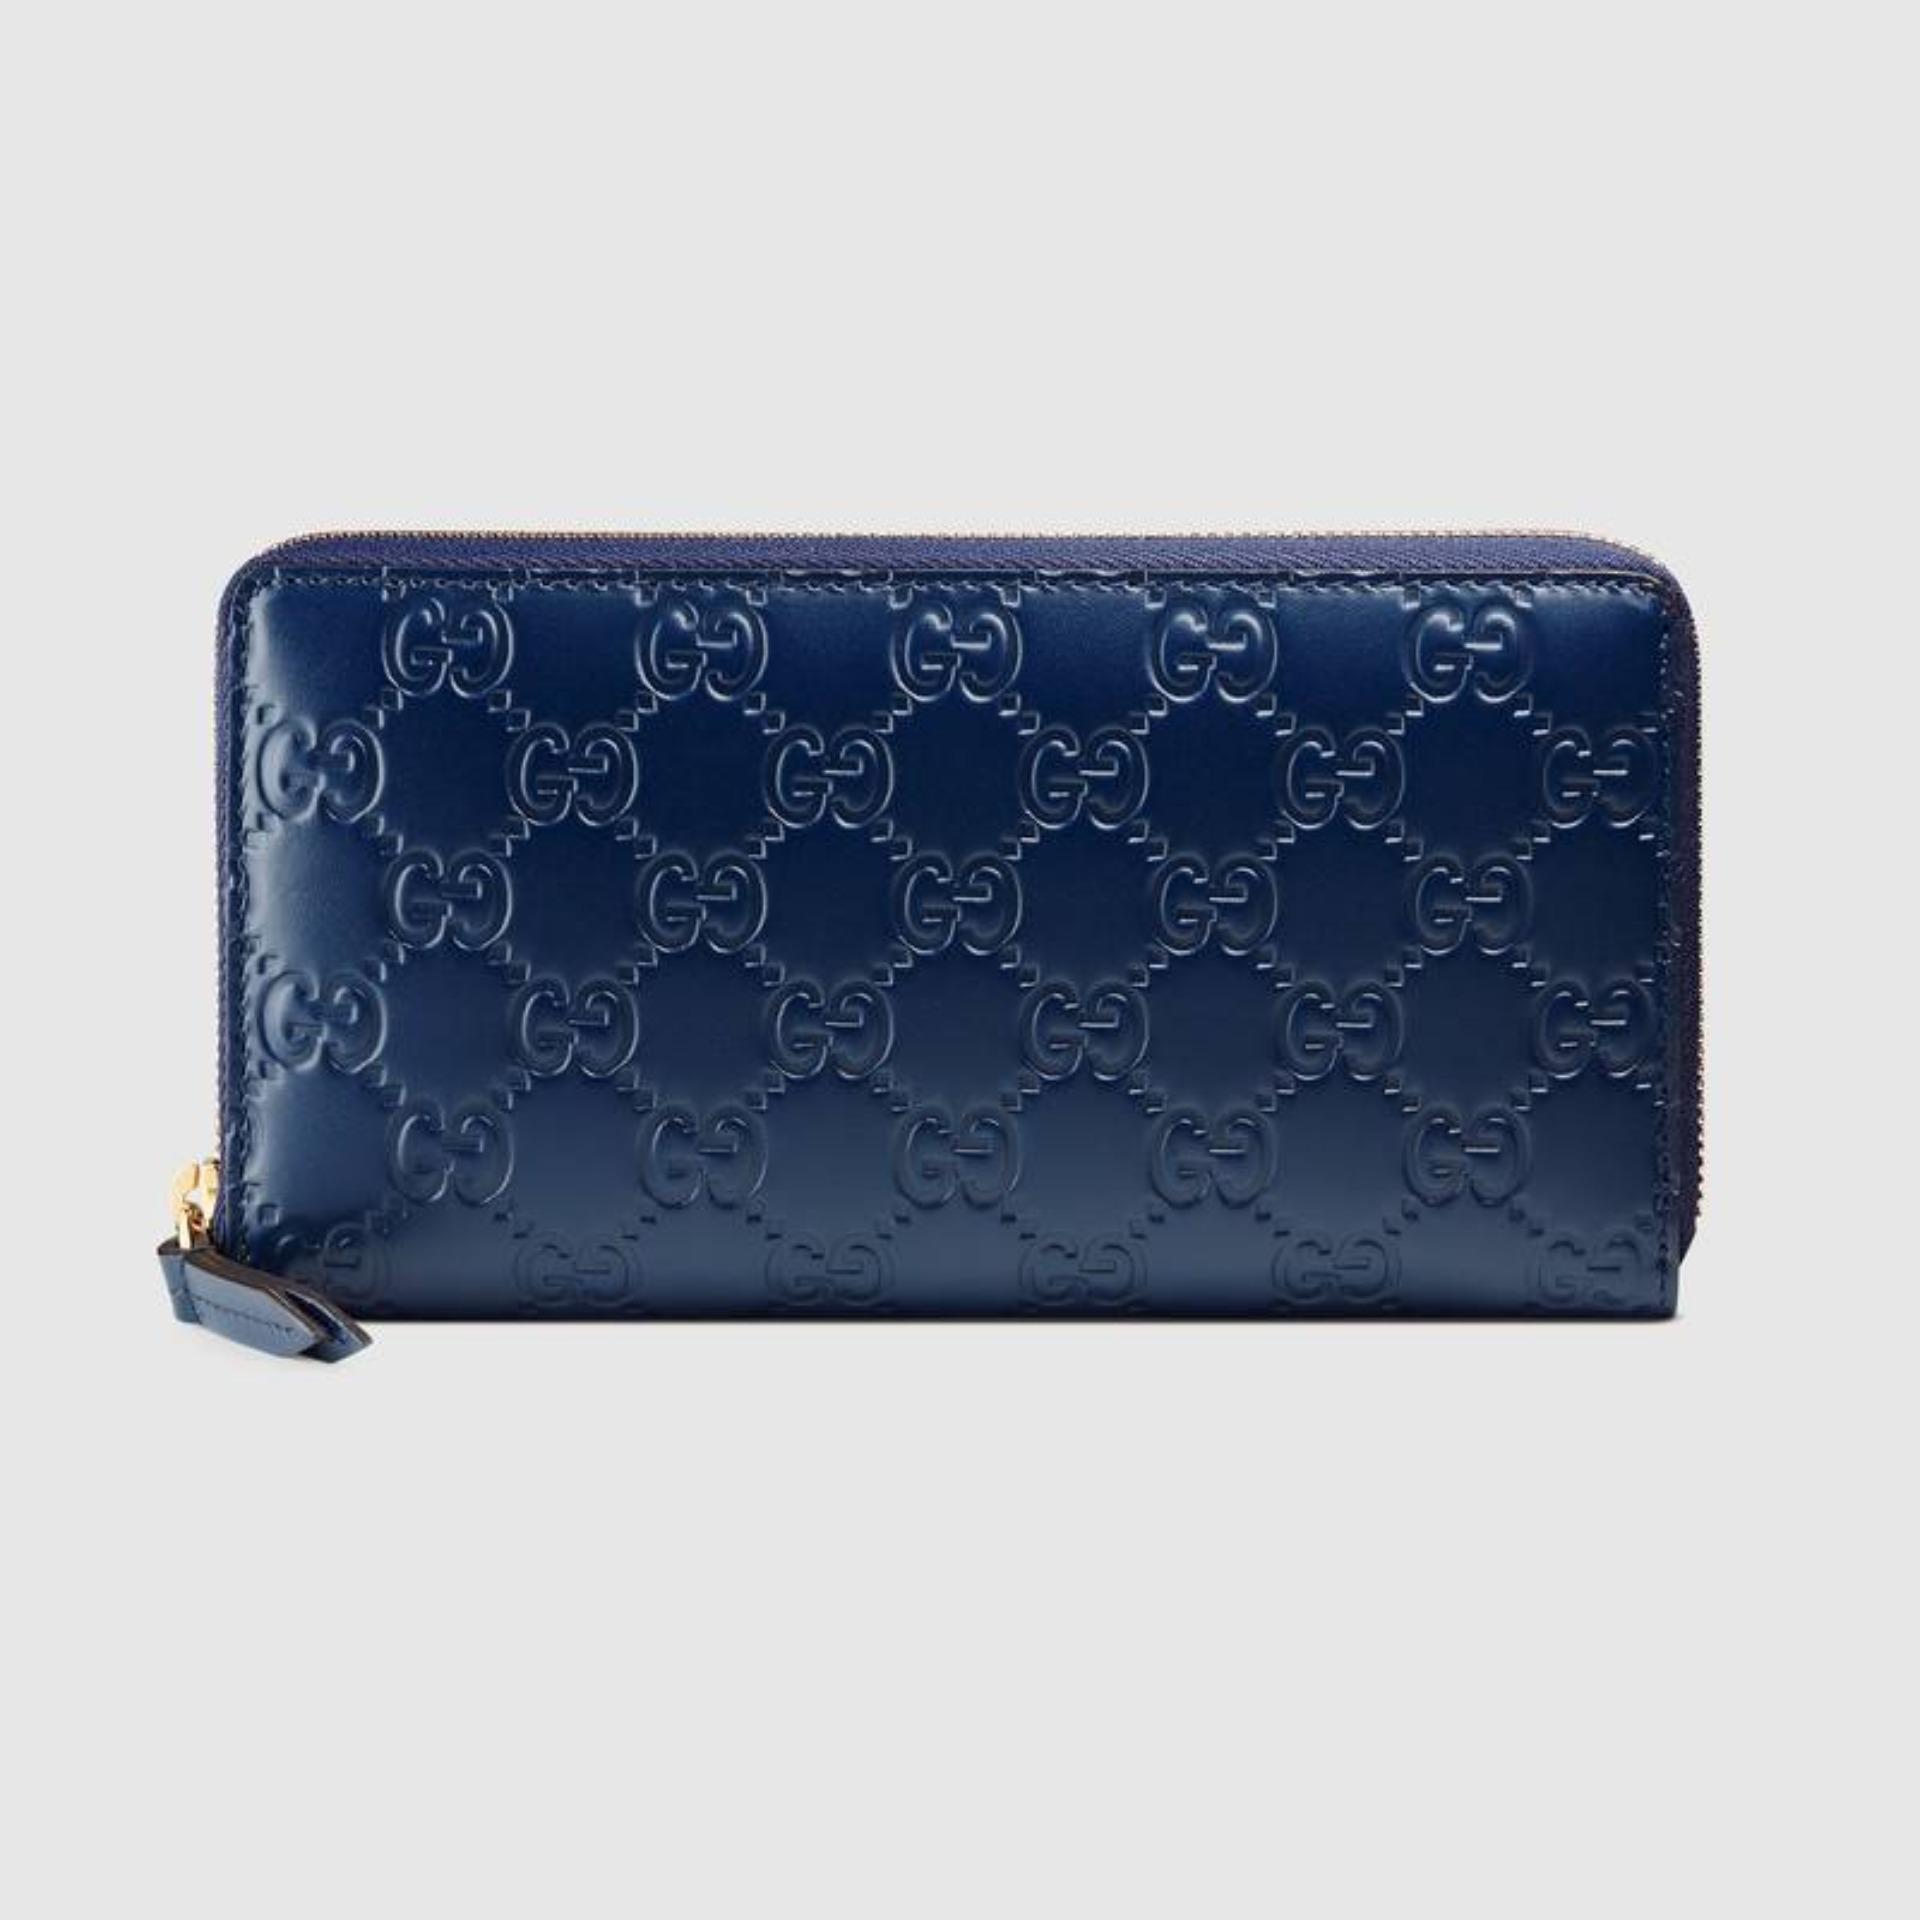 eb1caa25d234 Gucci Signature Leather Zip Around Wallet (Dark Blue) # 410102CWC1G4157